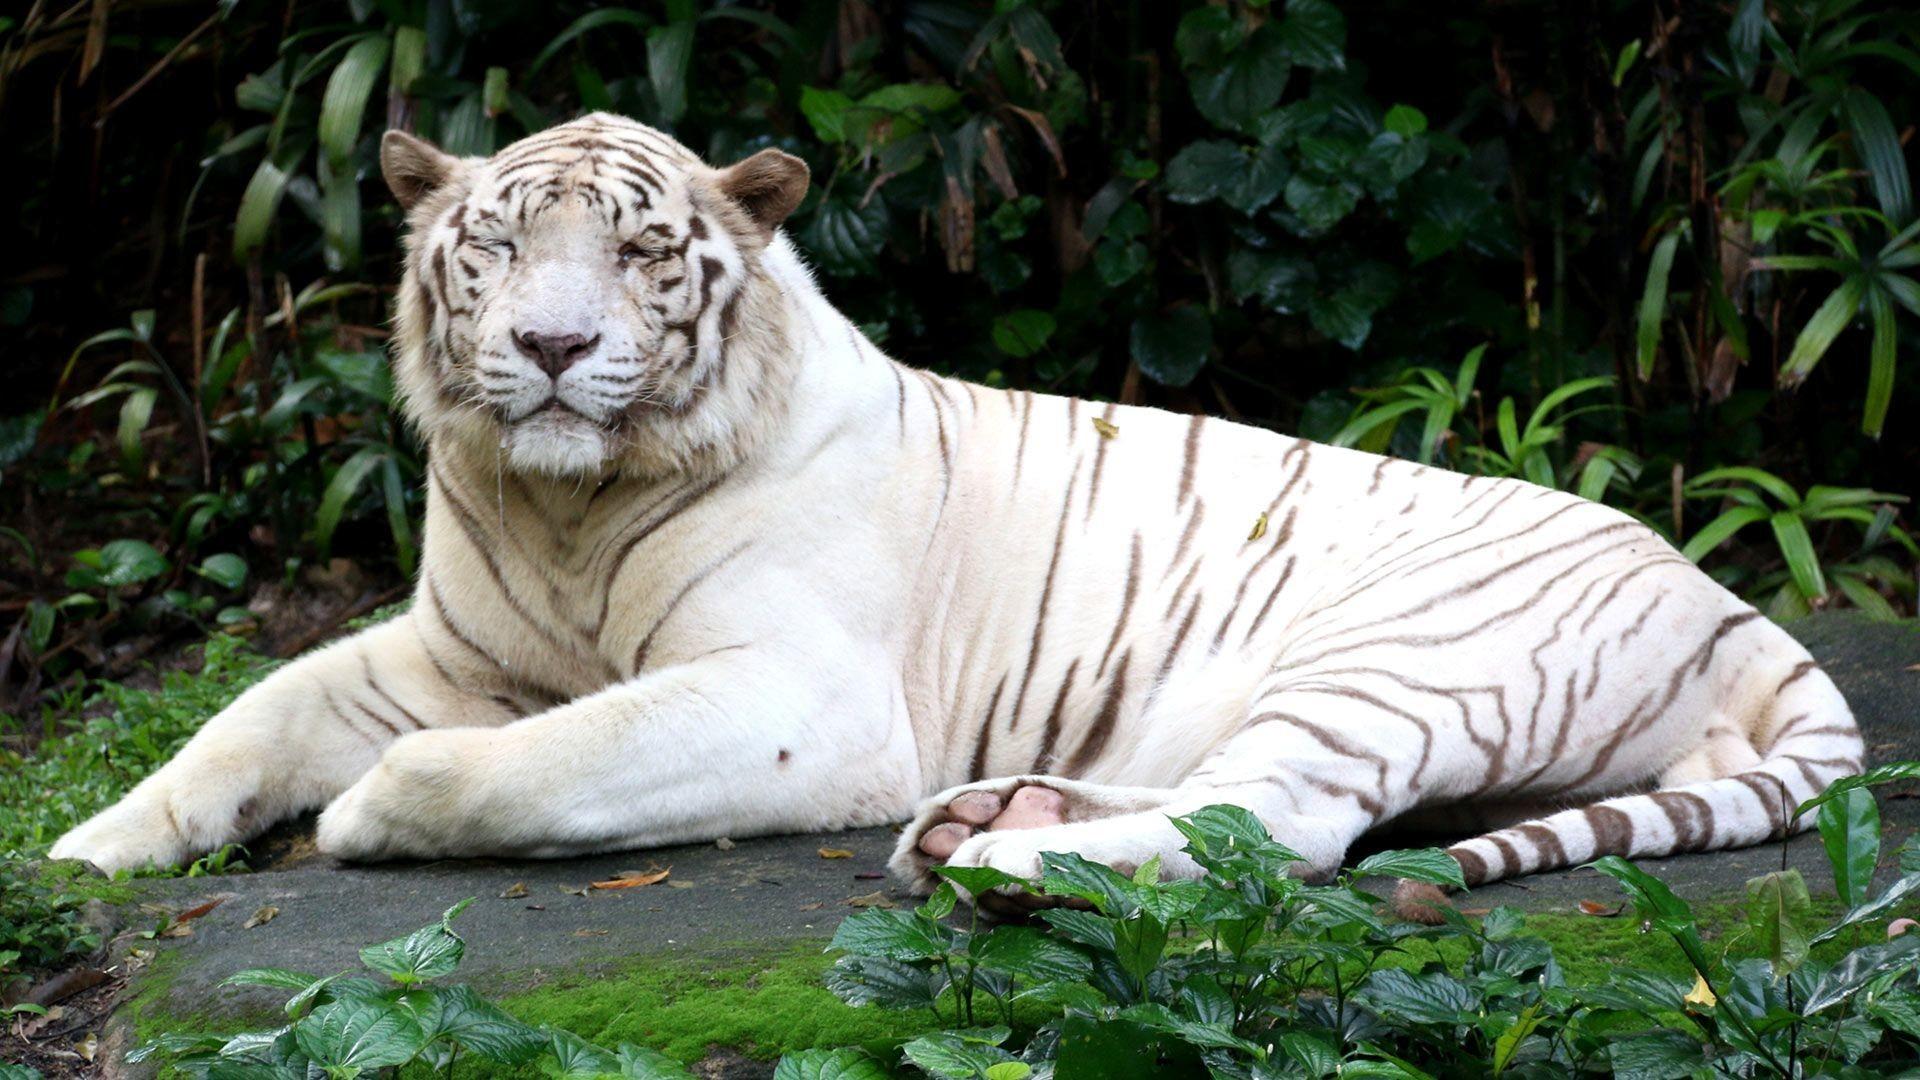 Tiger HD Wallpapers For Desktop Group